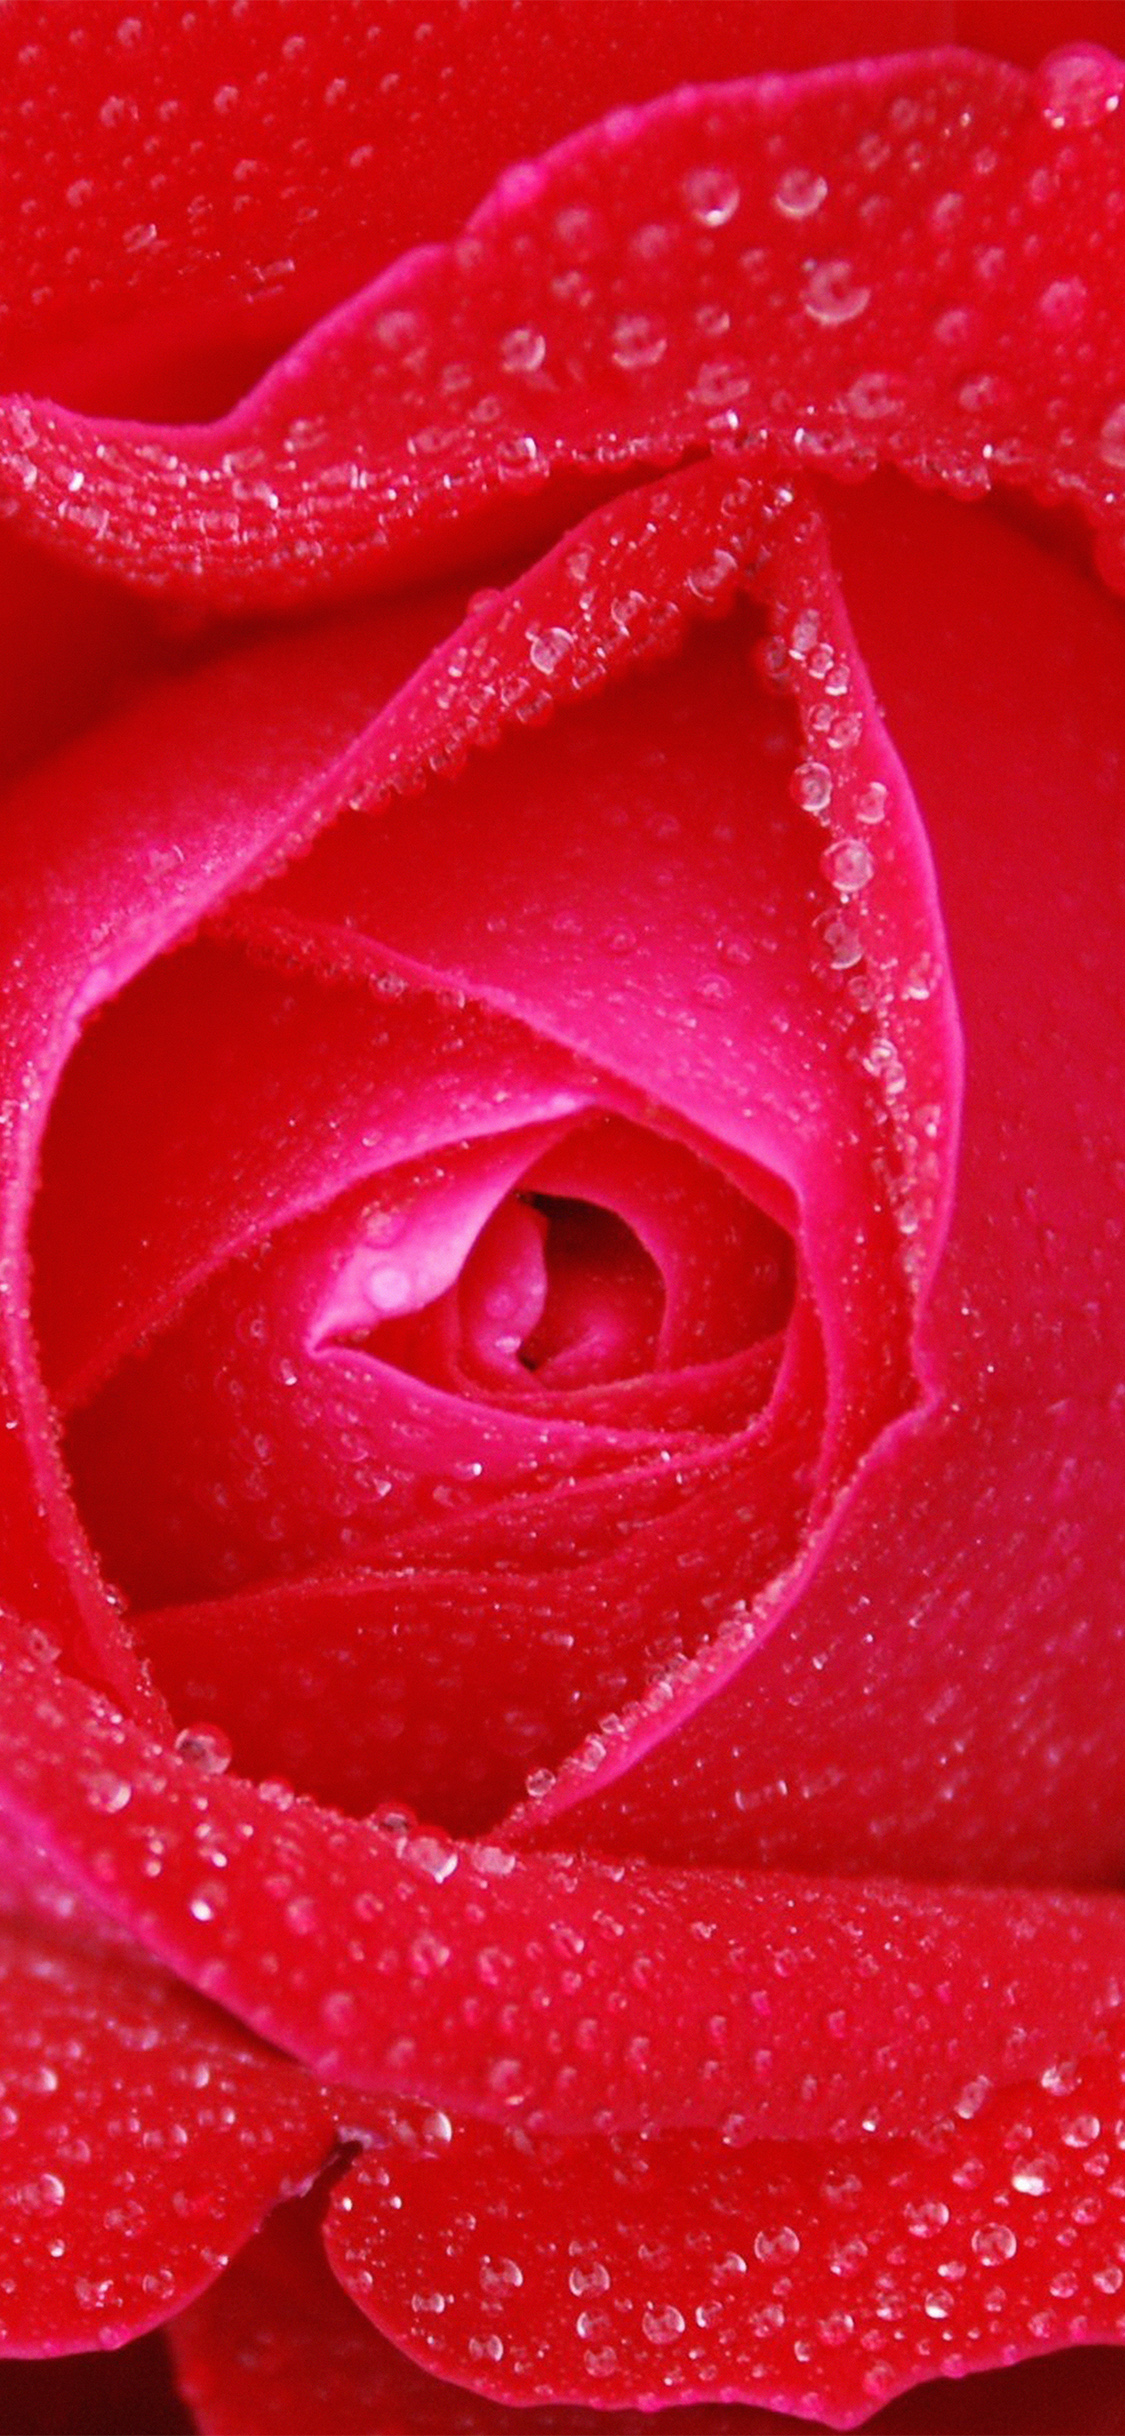 iPhoneXpapers.com-Apple-iPhone-wallpaper-no95-rose-red-rain-zoom-closeup-nature